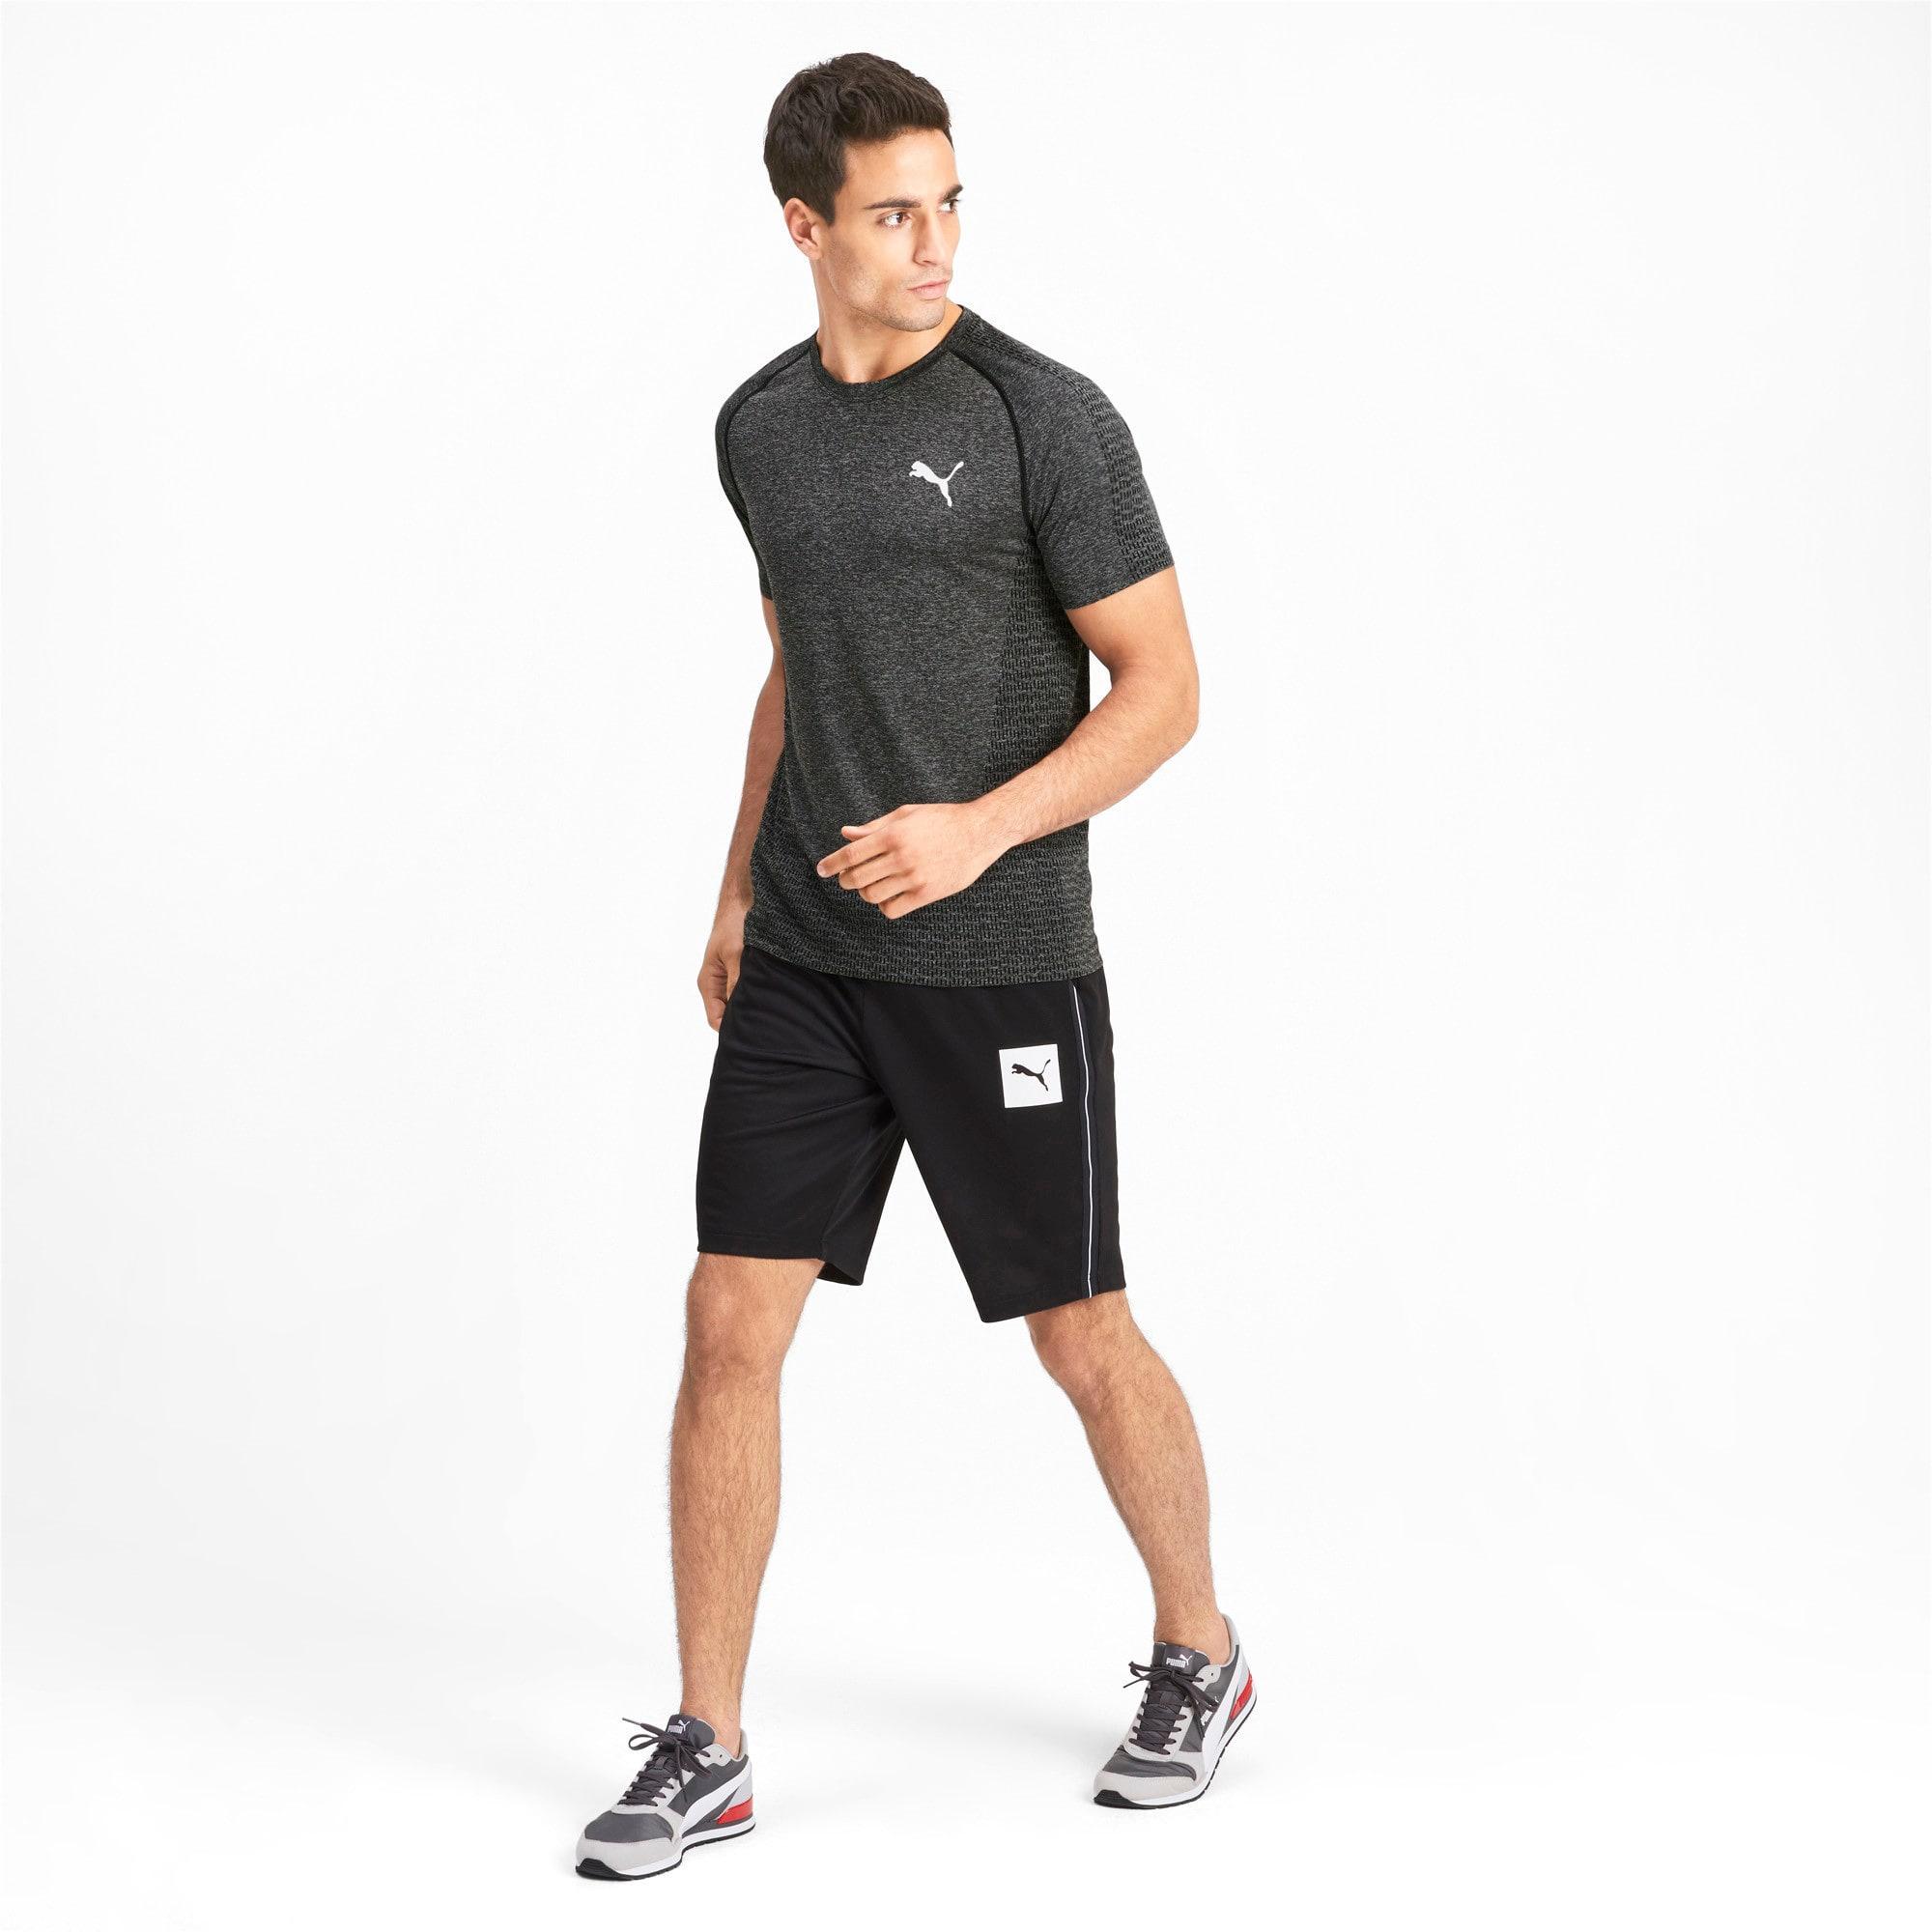 Thumbnail 3 of Tec Sports evoKNIT Men's Basic Tee, Puma Black, medium-IND